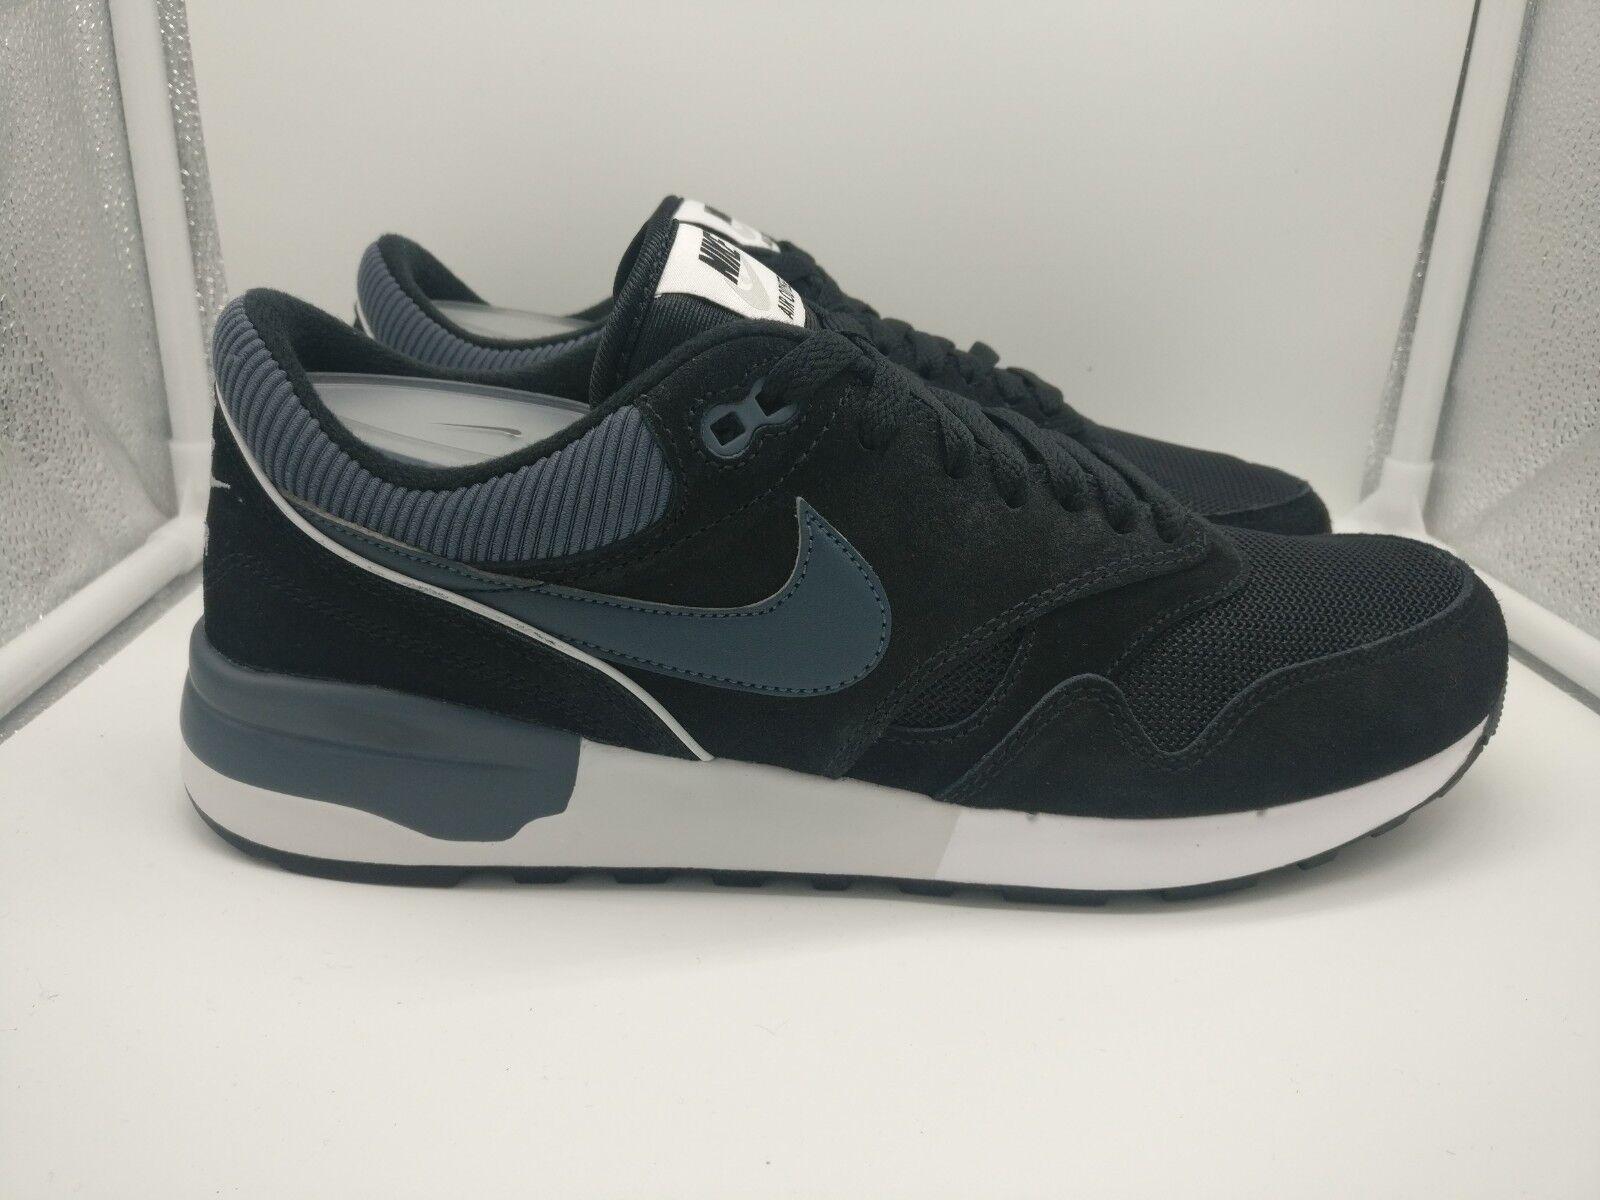 Nike Air Odyssey UK 6.5 Black Dark Magnet Grey 652989-001